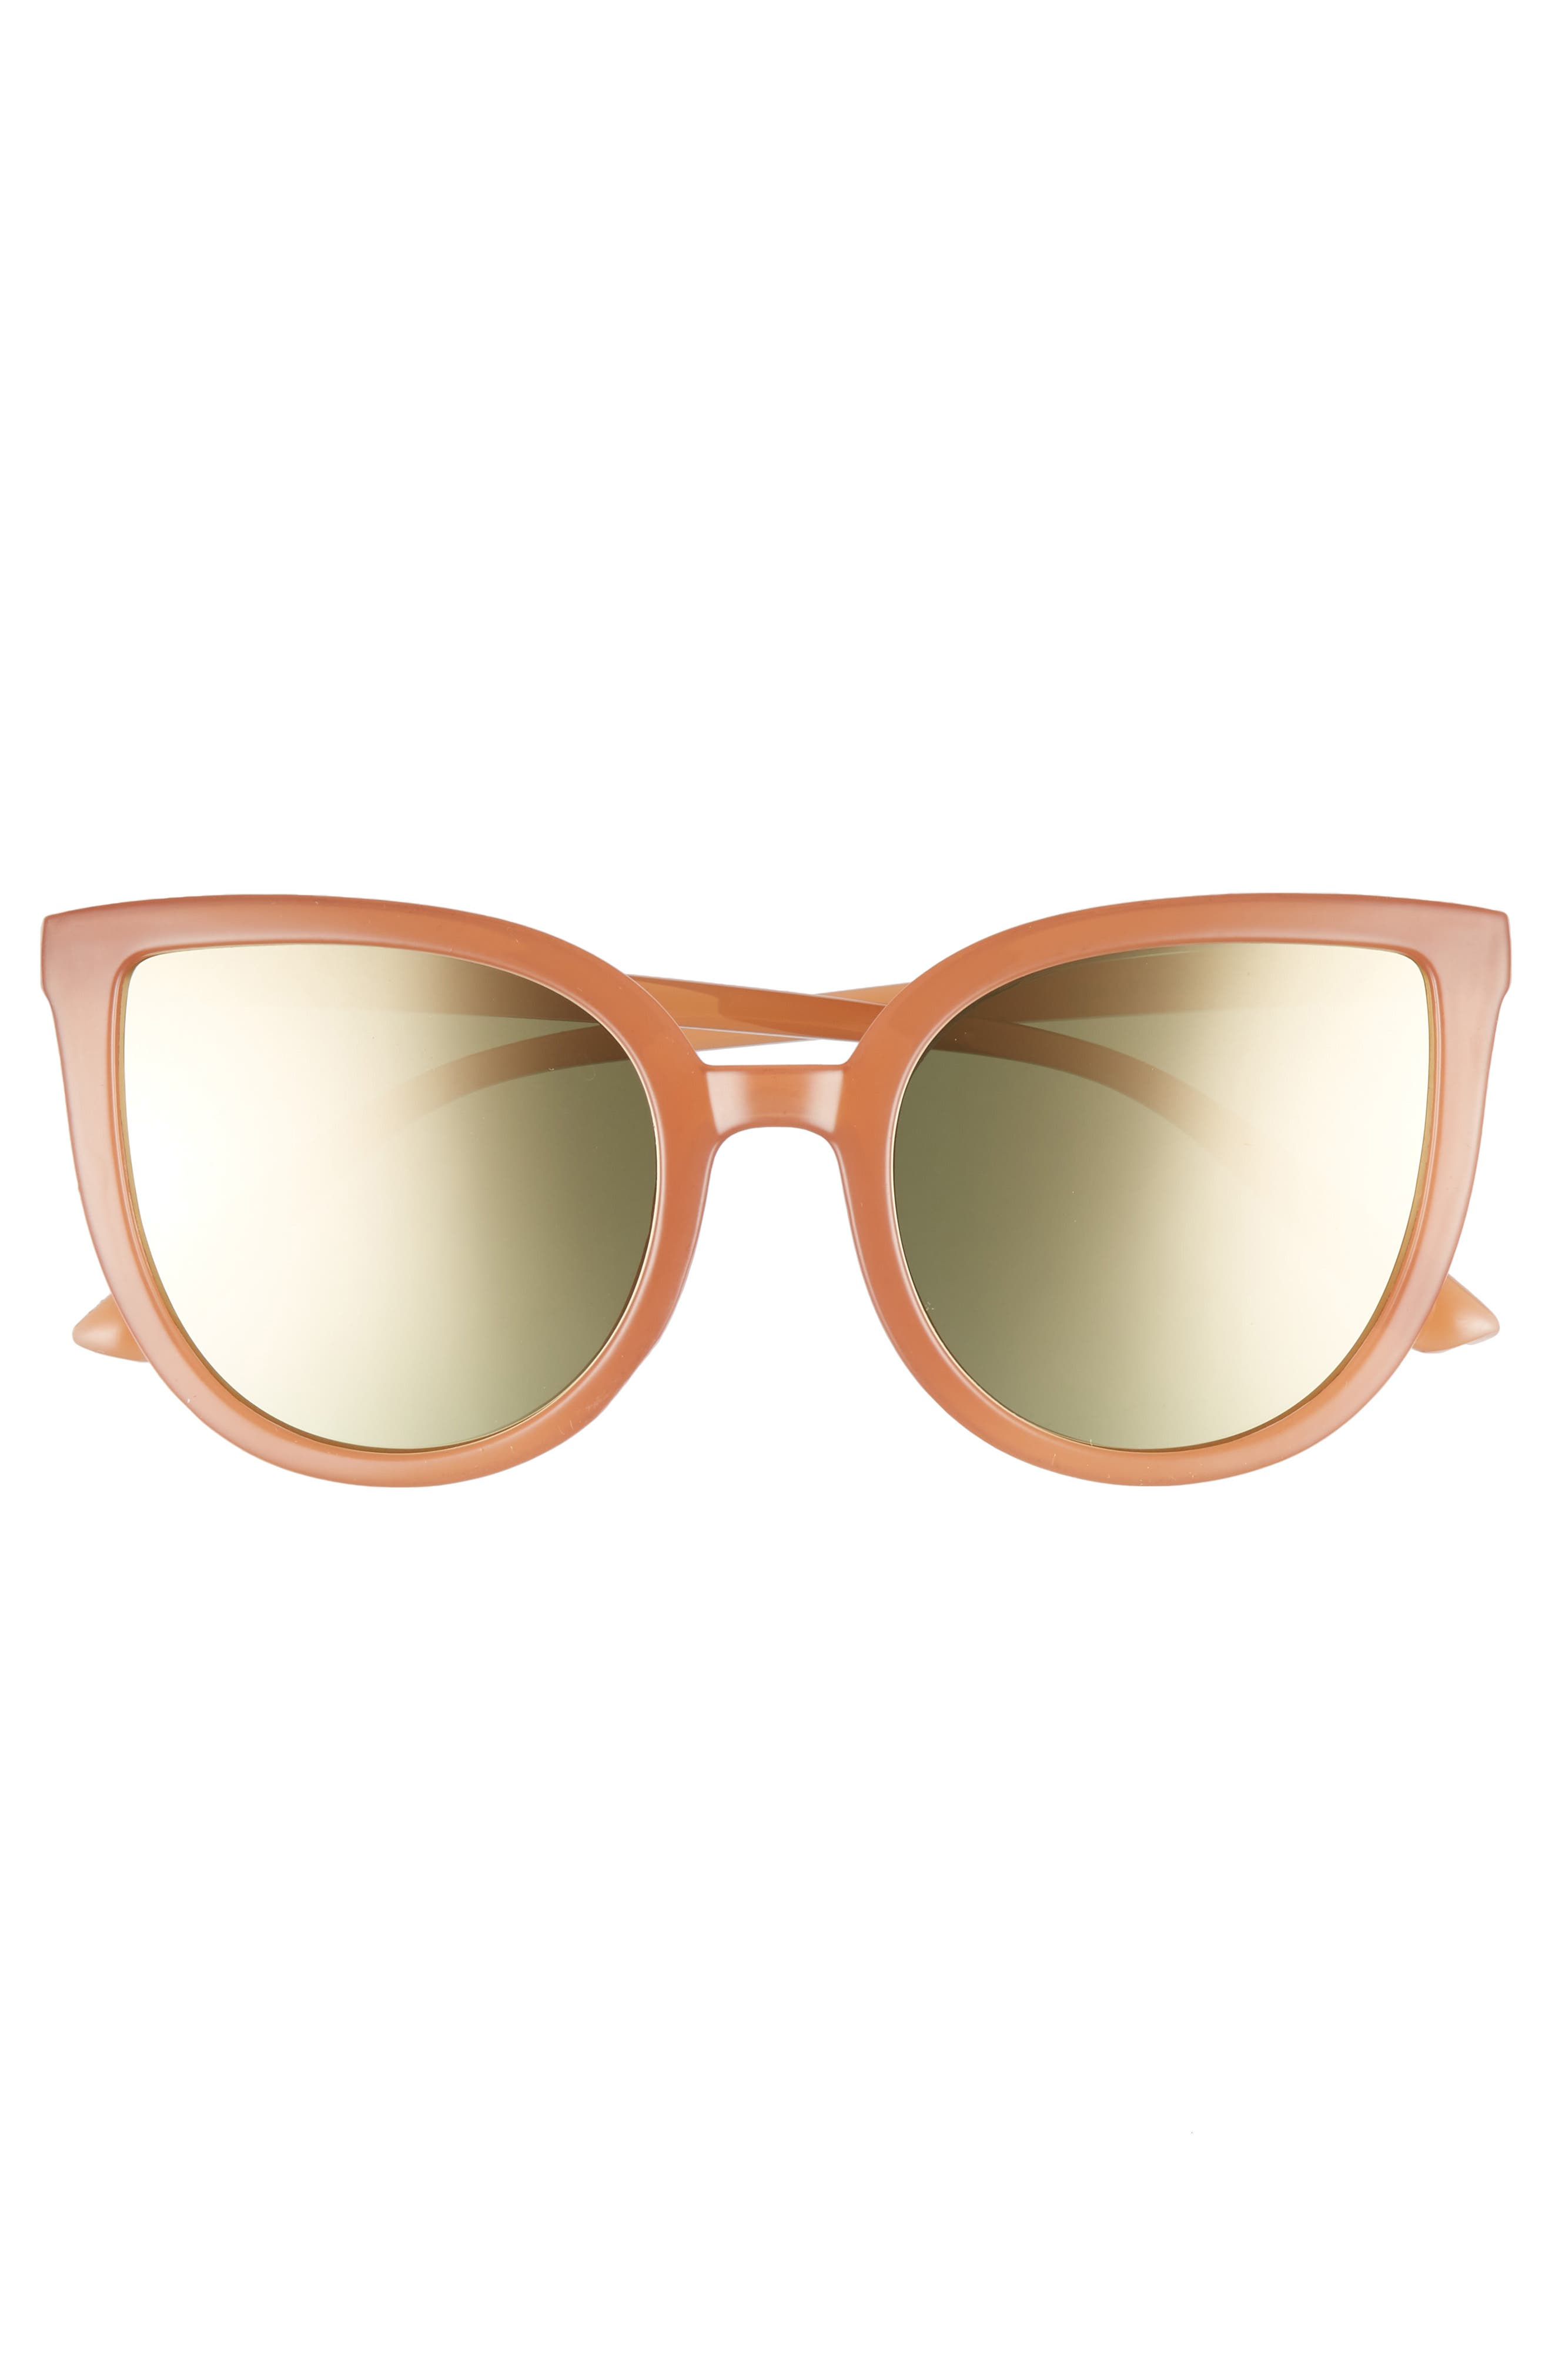 Thin Cat Eye Sunglasses,                             Alternate thumbnail 3, color,                             Milky Peach/ Gold